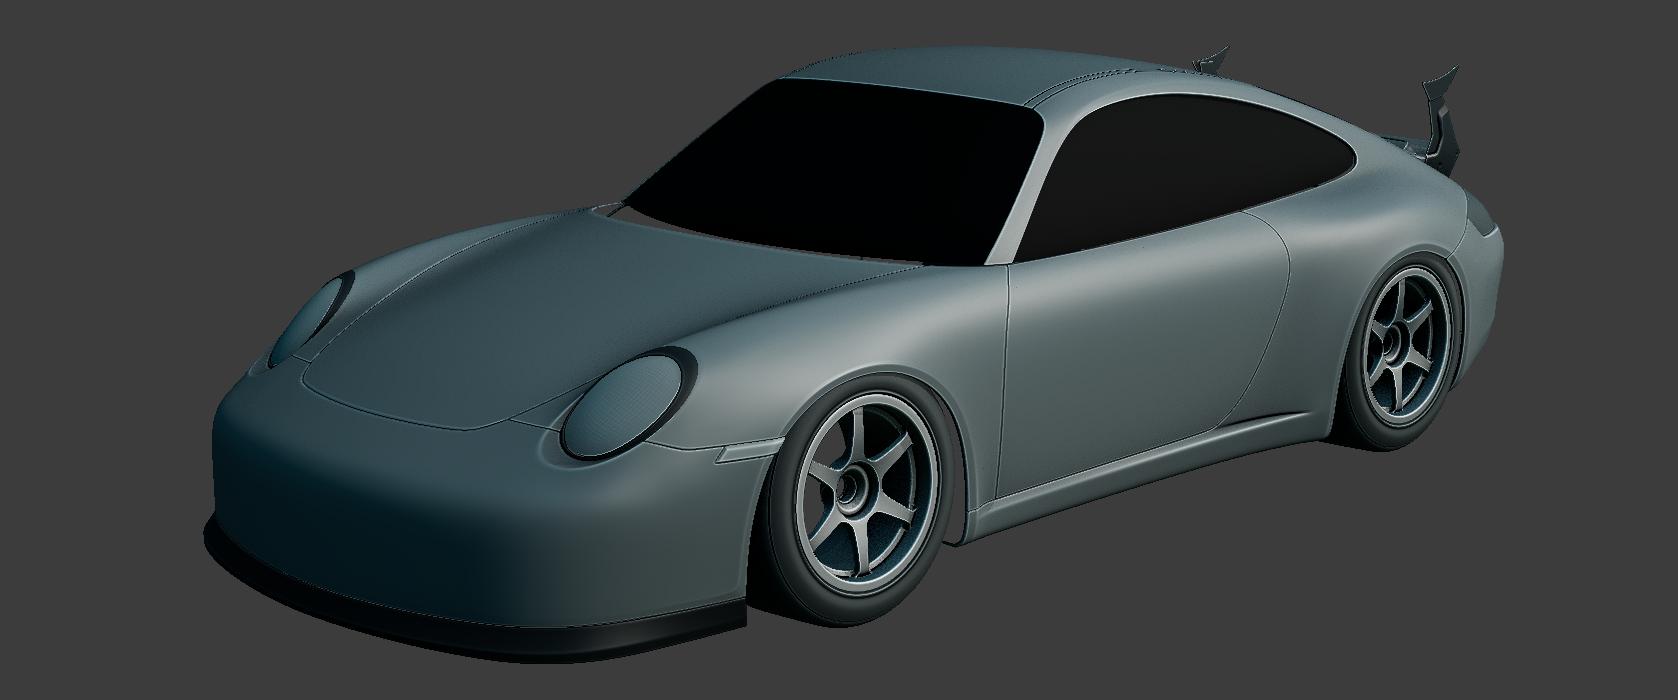 997.1 GT3- Car Render Challenge 2020